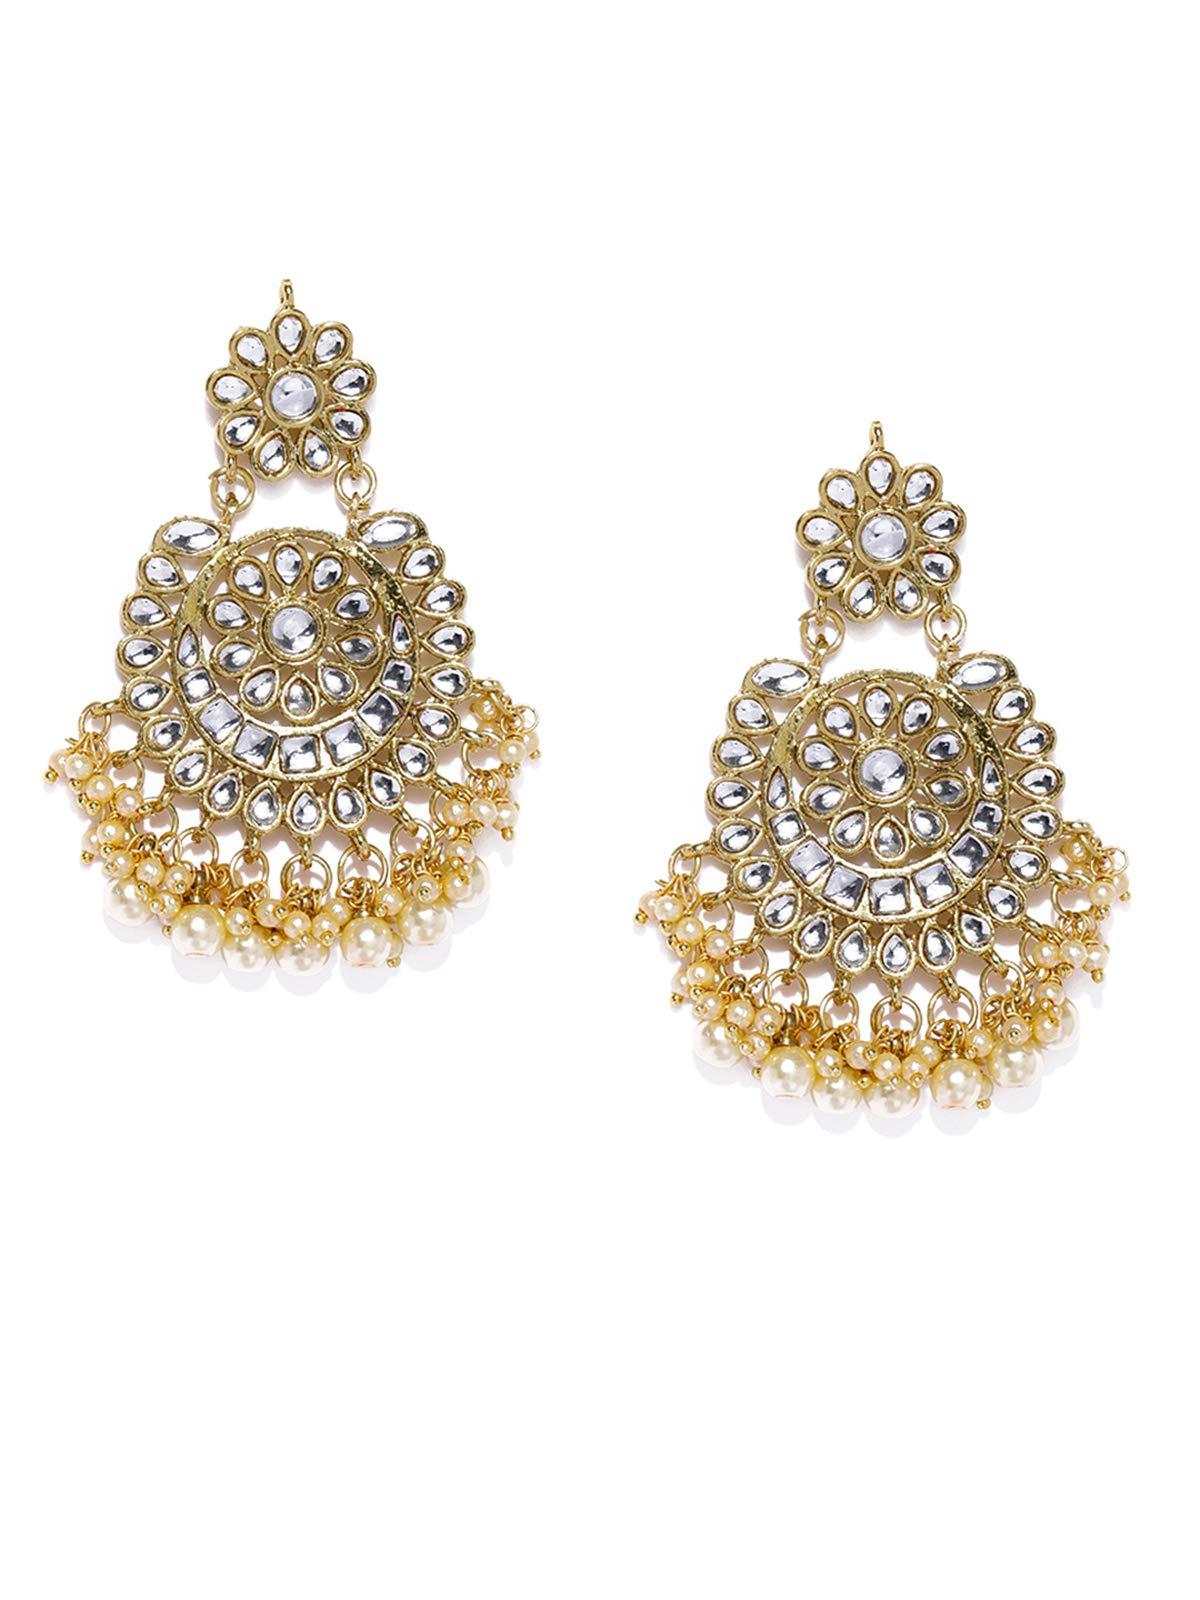 Zaveri Pearls Gold Tone Kundan & Pearls Dangle Earring For Women-ZPFK8662 (B07Q539B7N) Amazon Price History, Amazon Price Tracker